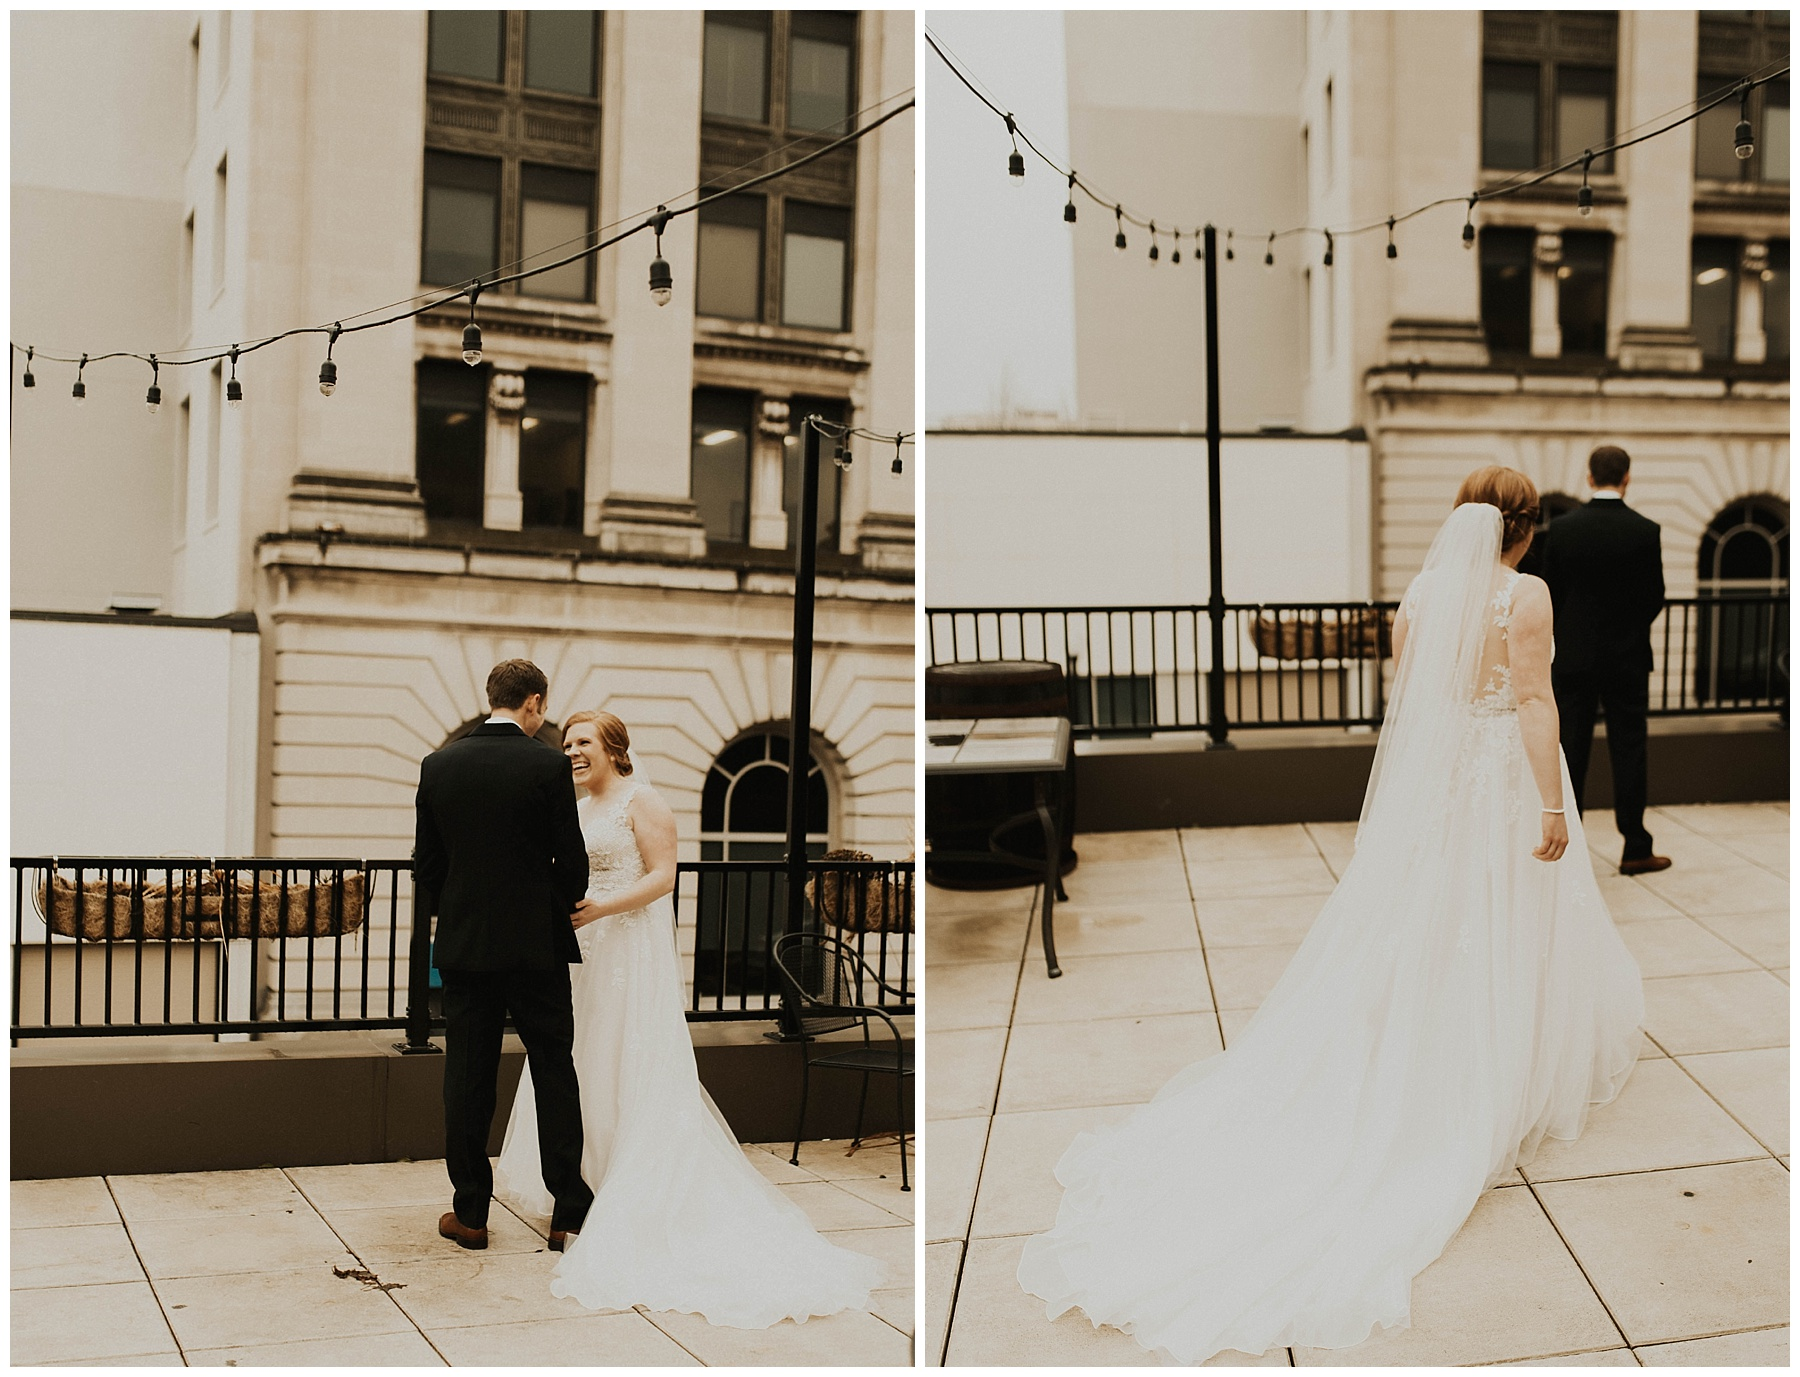 Lauren otography JohnnyEliza Wedding Winter Classic F b76fvIYgym